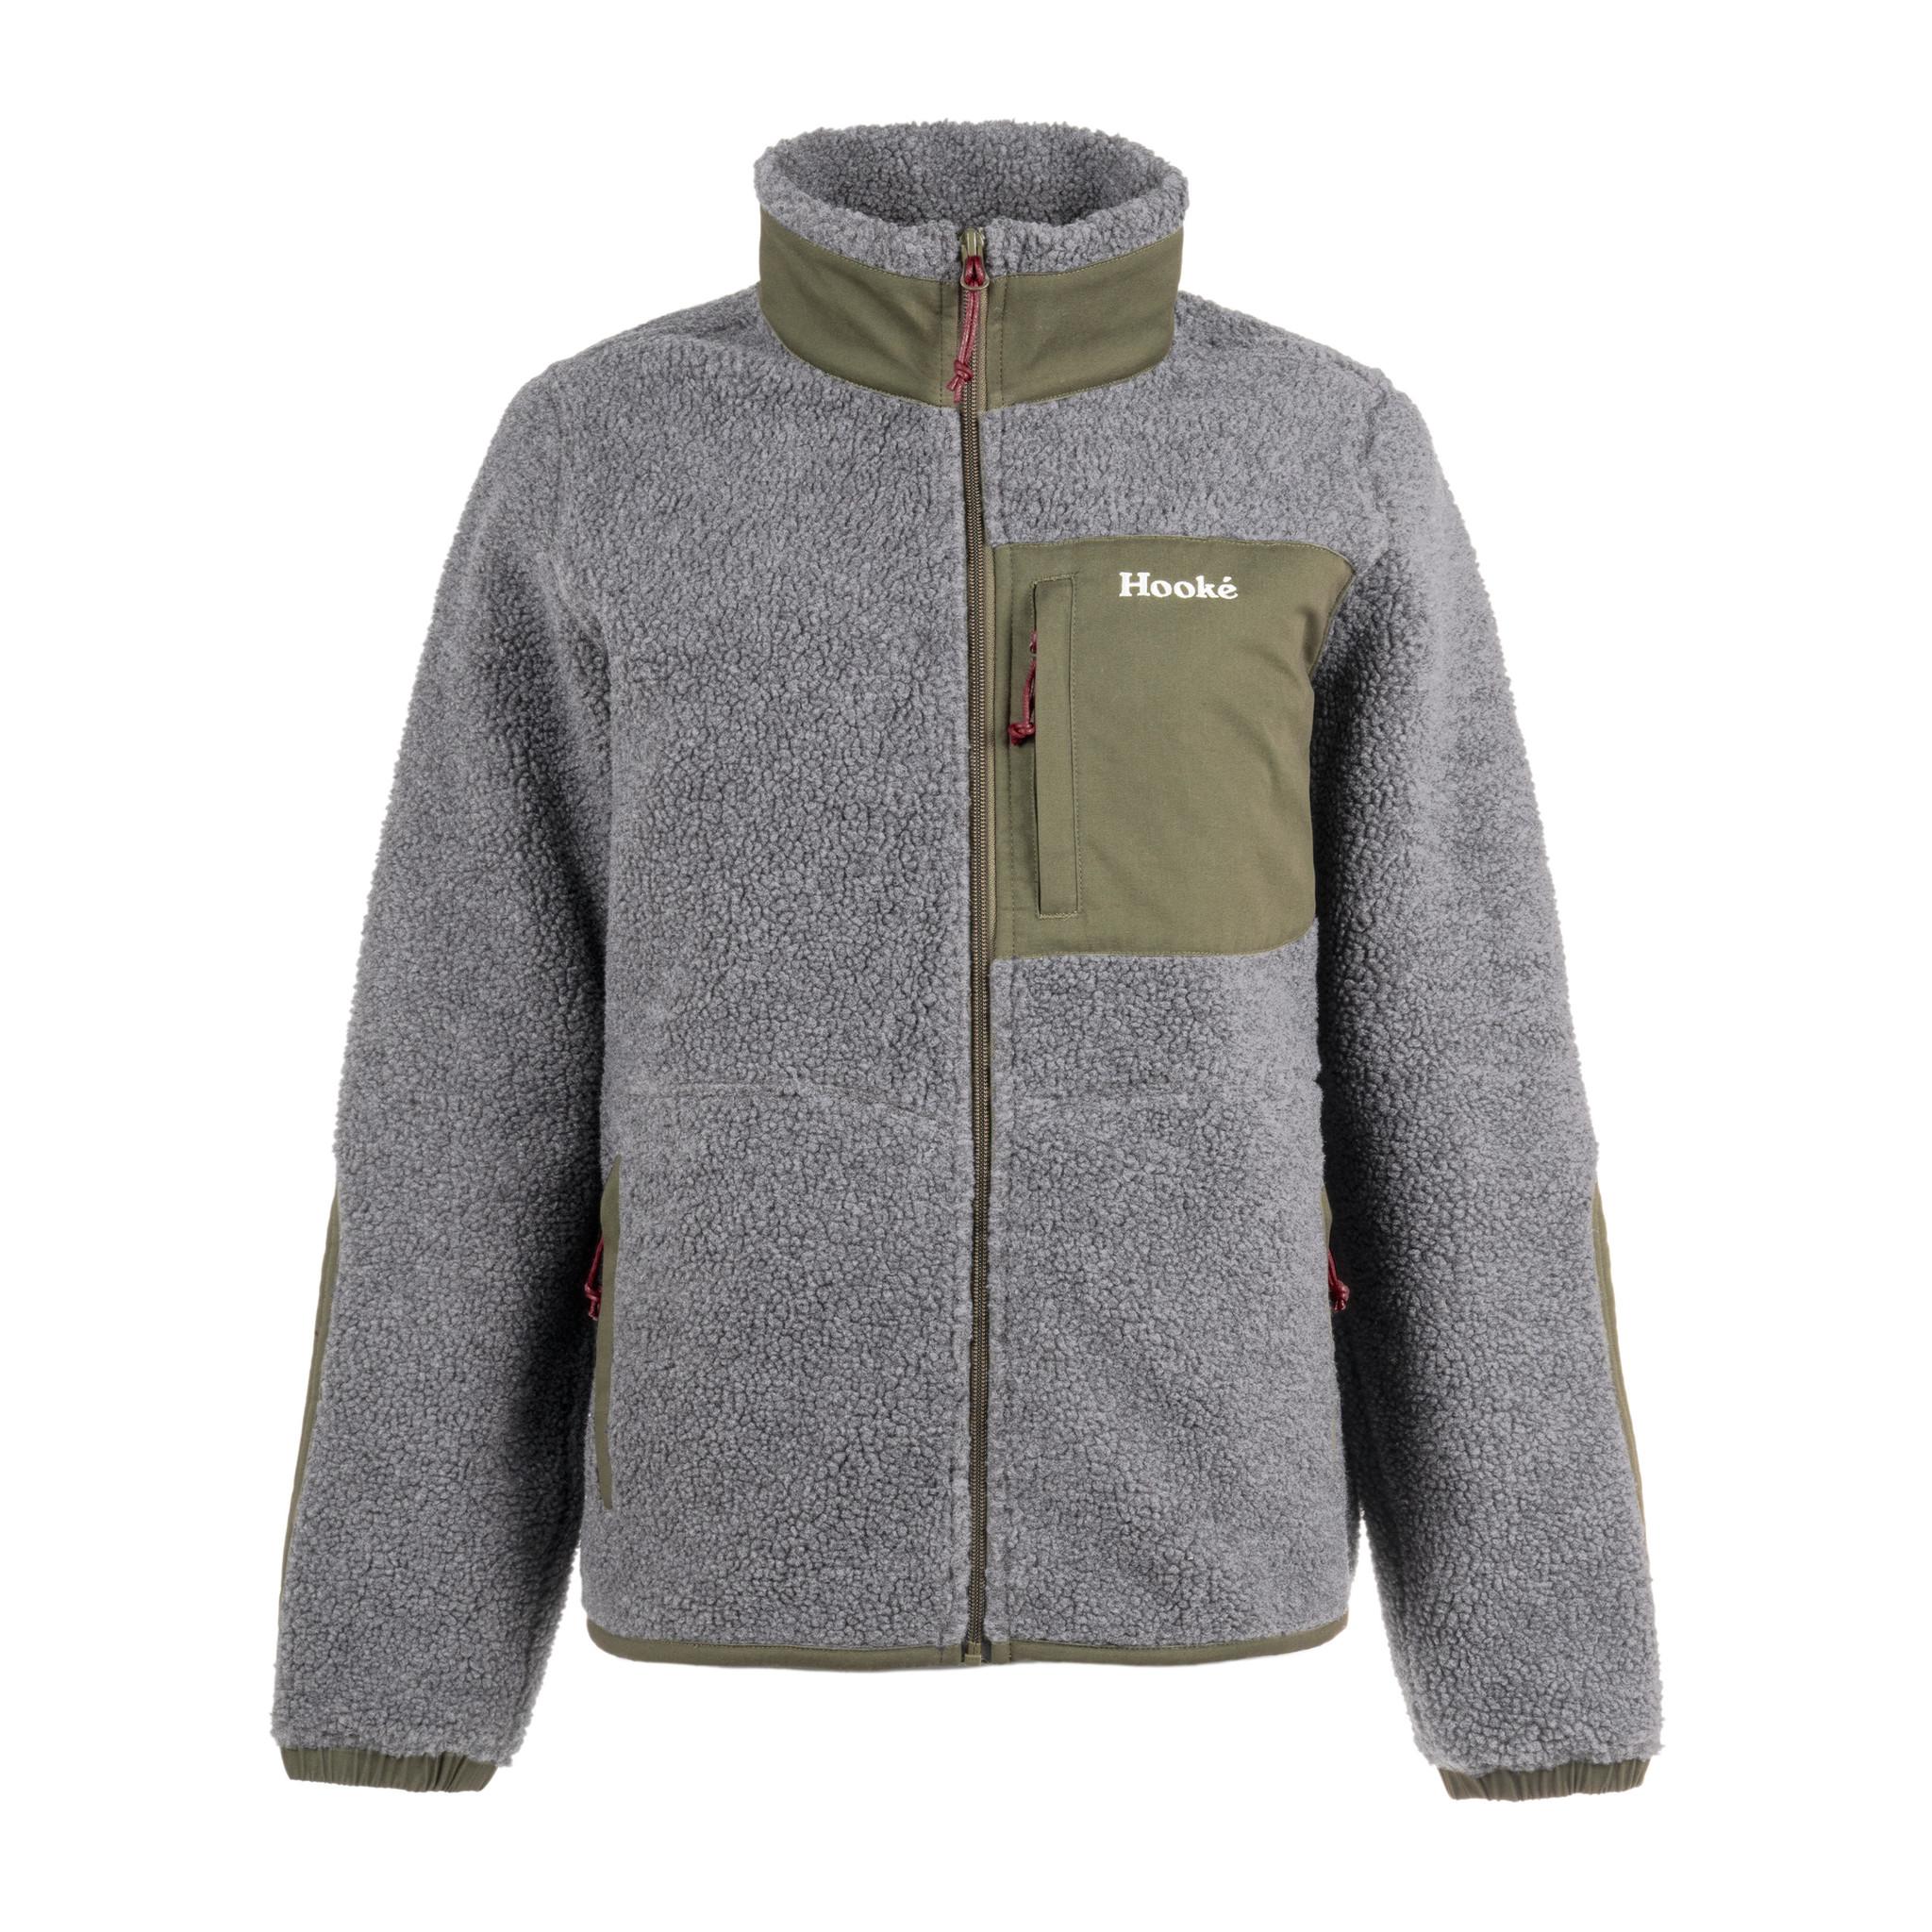 Rabaska Sherpa Fleece Jacket